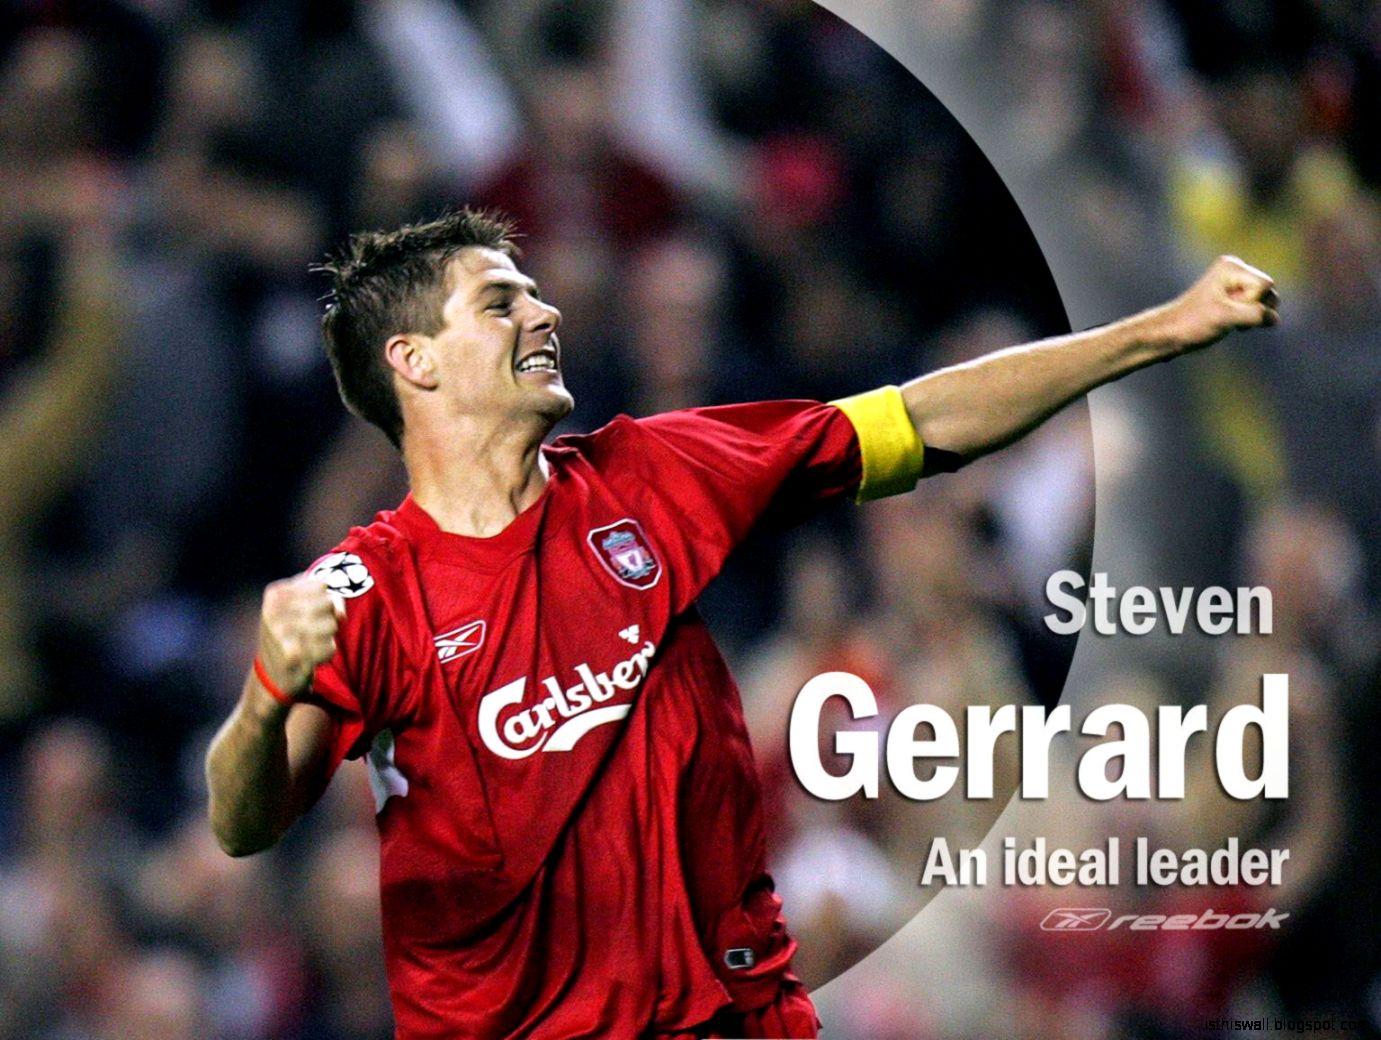 Steven Gerrard Wallpapers Liverpool Wallpapers Steven Gerrard